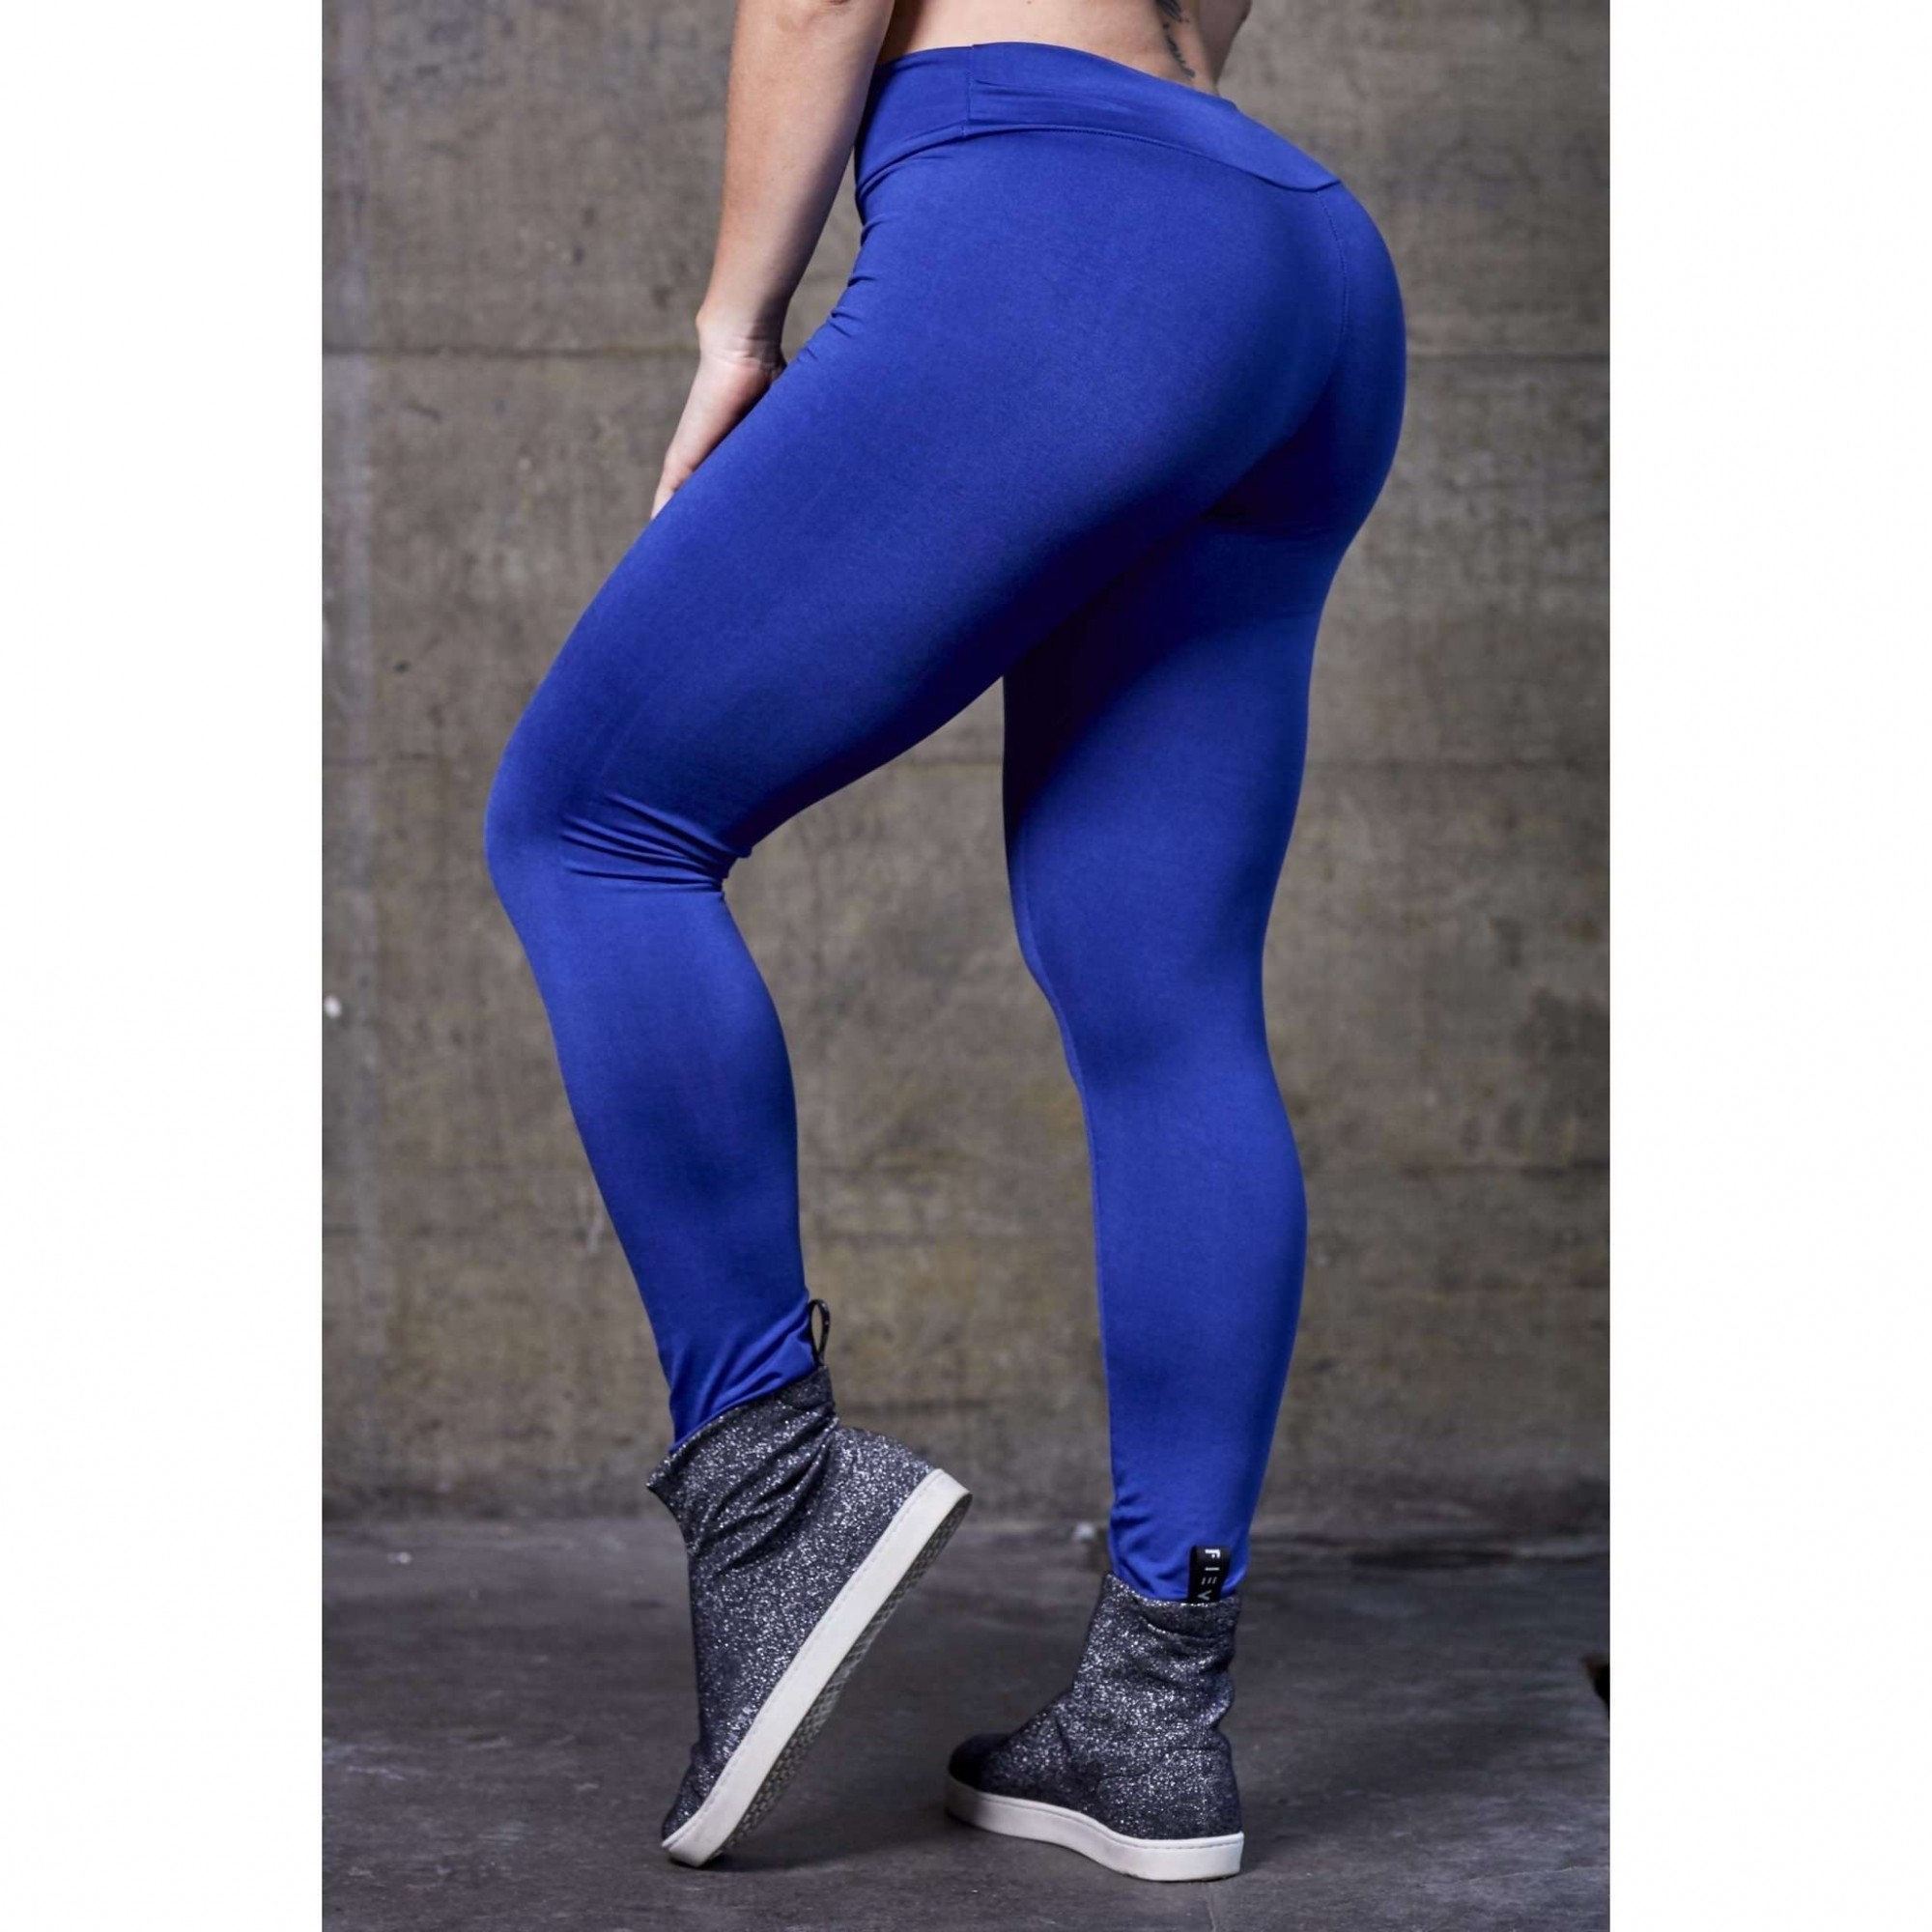 Calça Legging Ziper  - Fribasex - Fabricasex.com